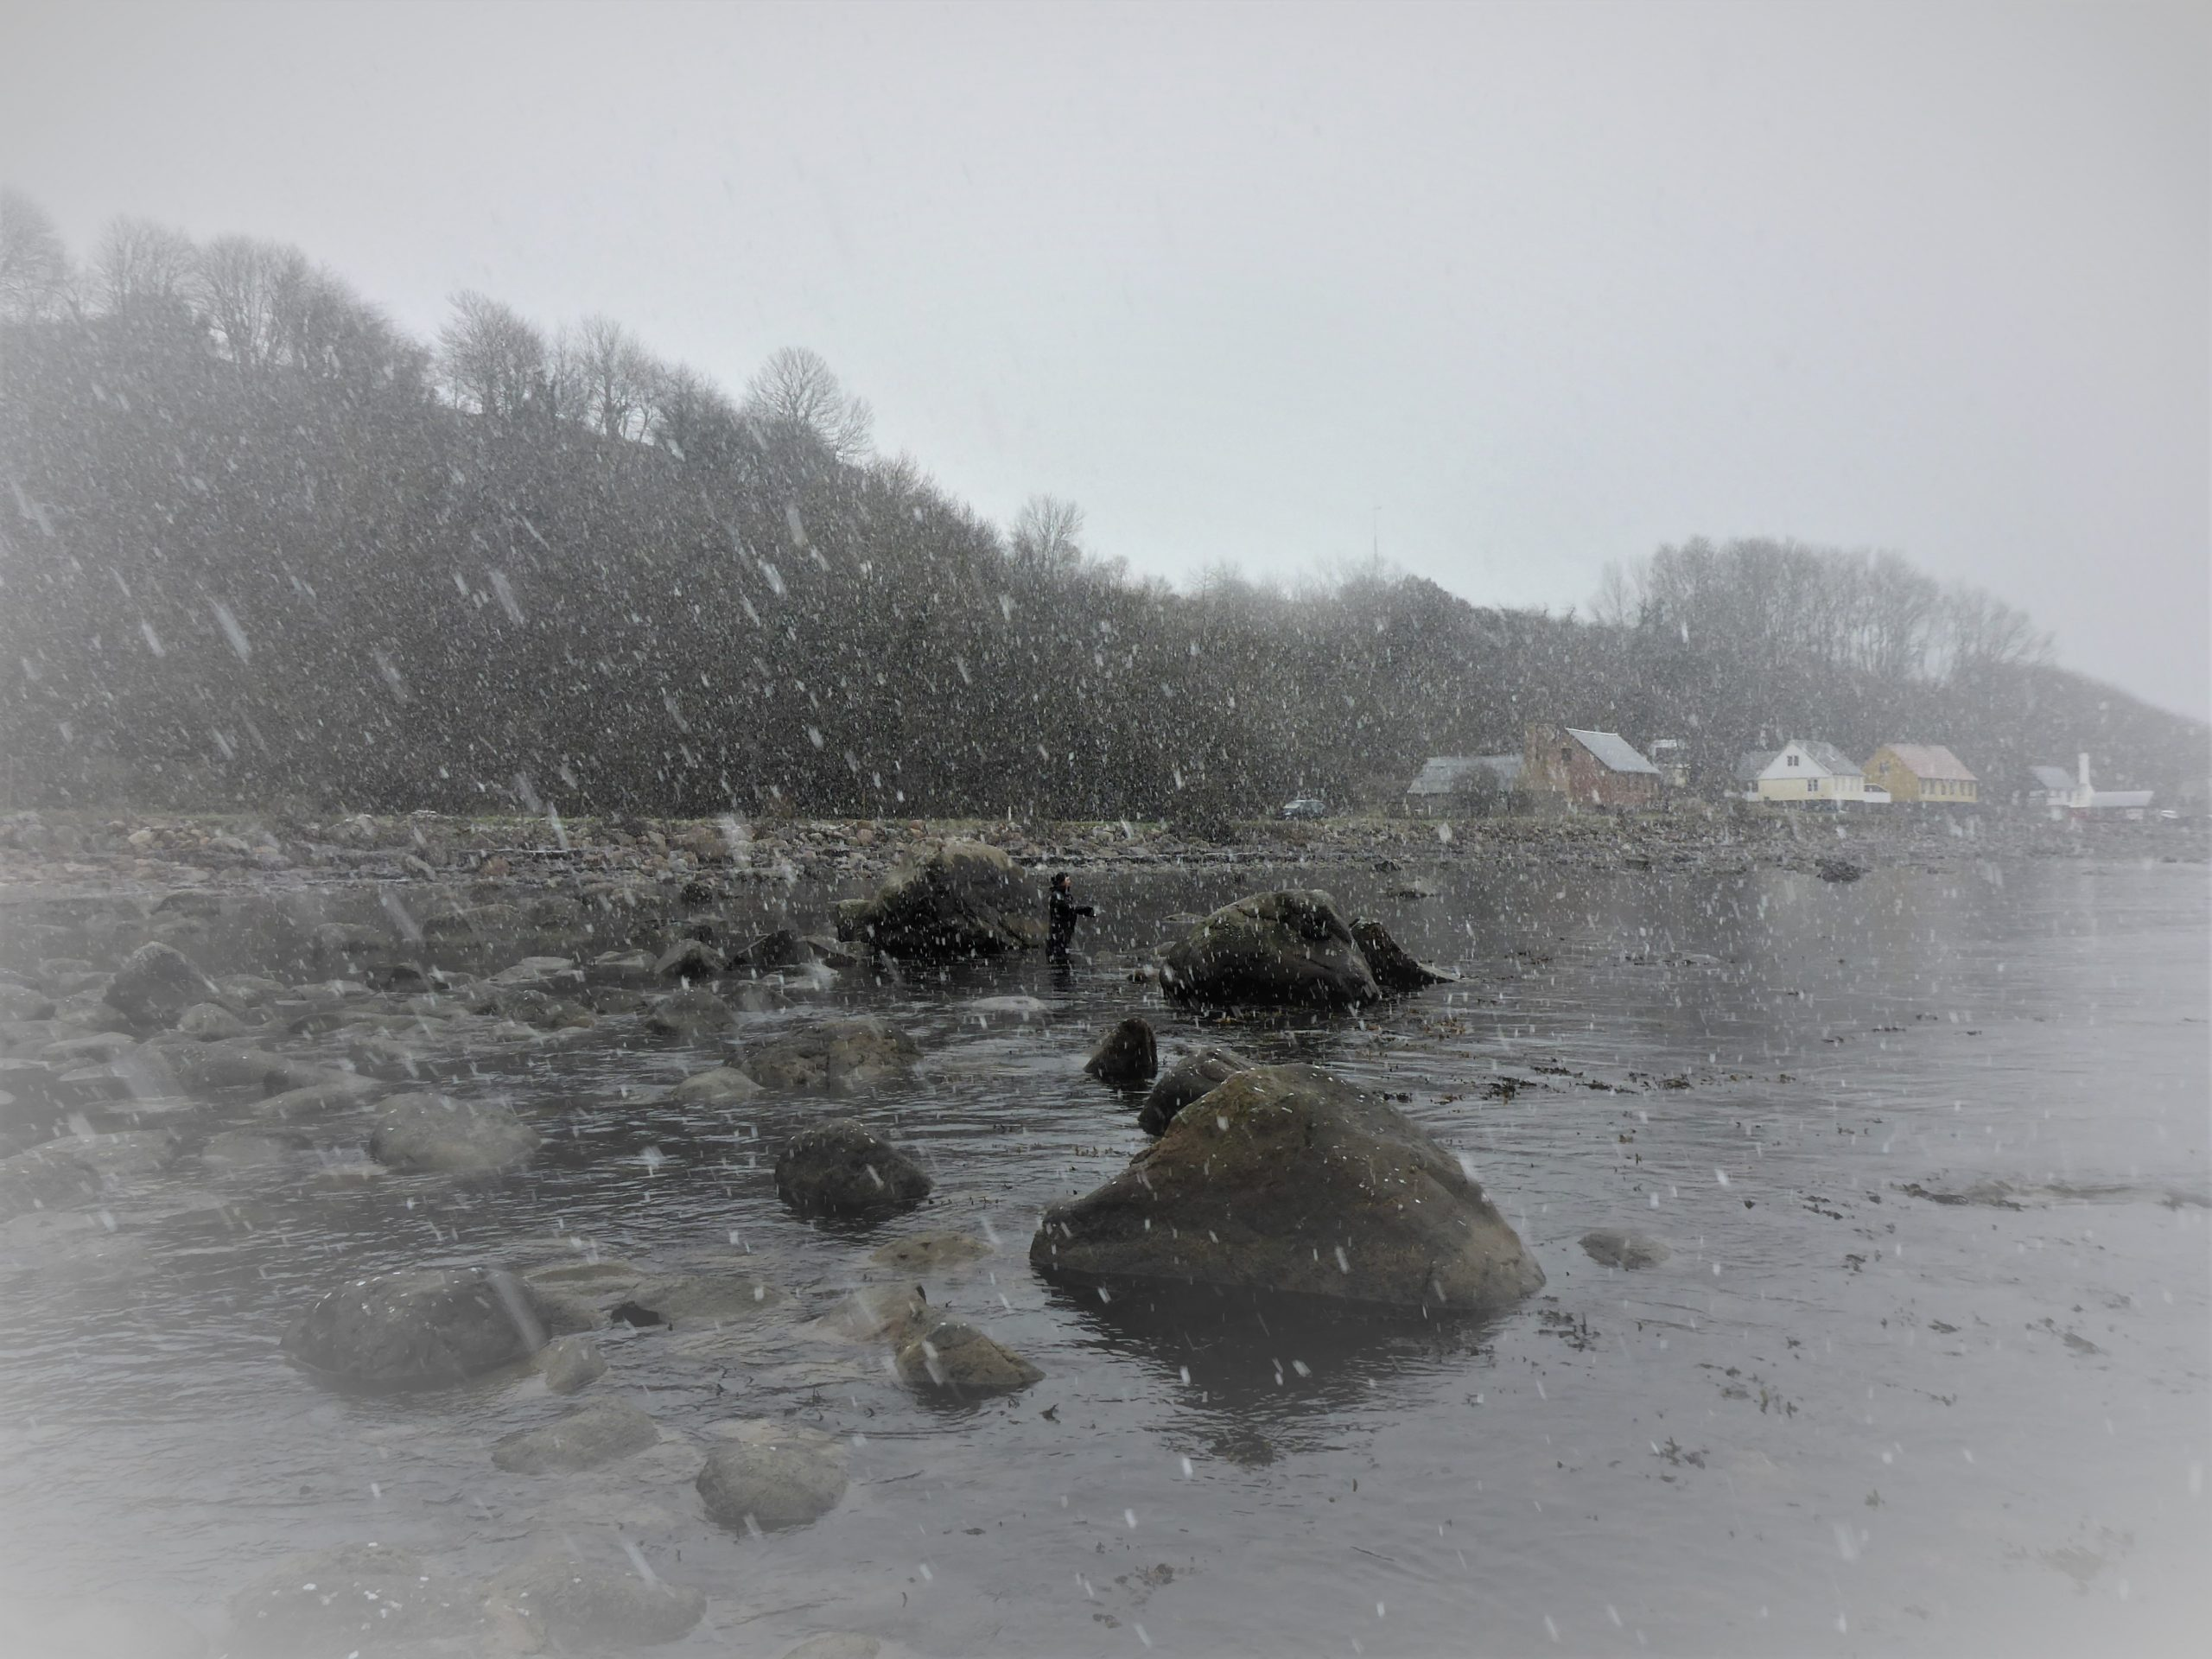 Kystfiskeri om vinteren på Bornholm.